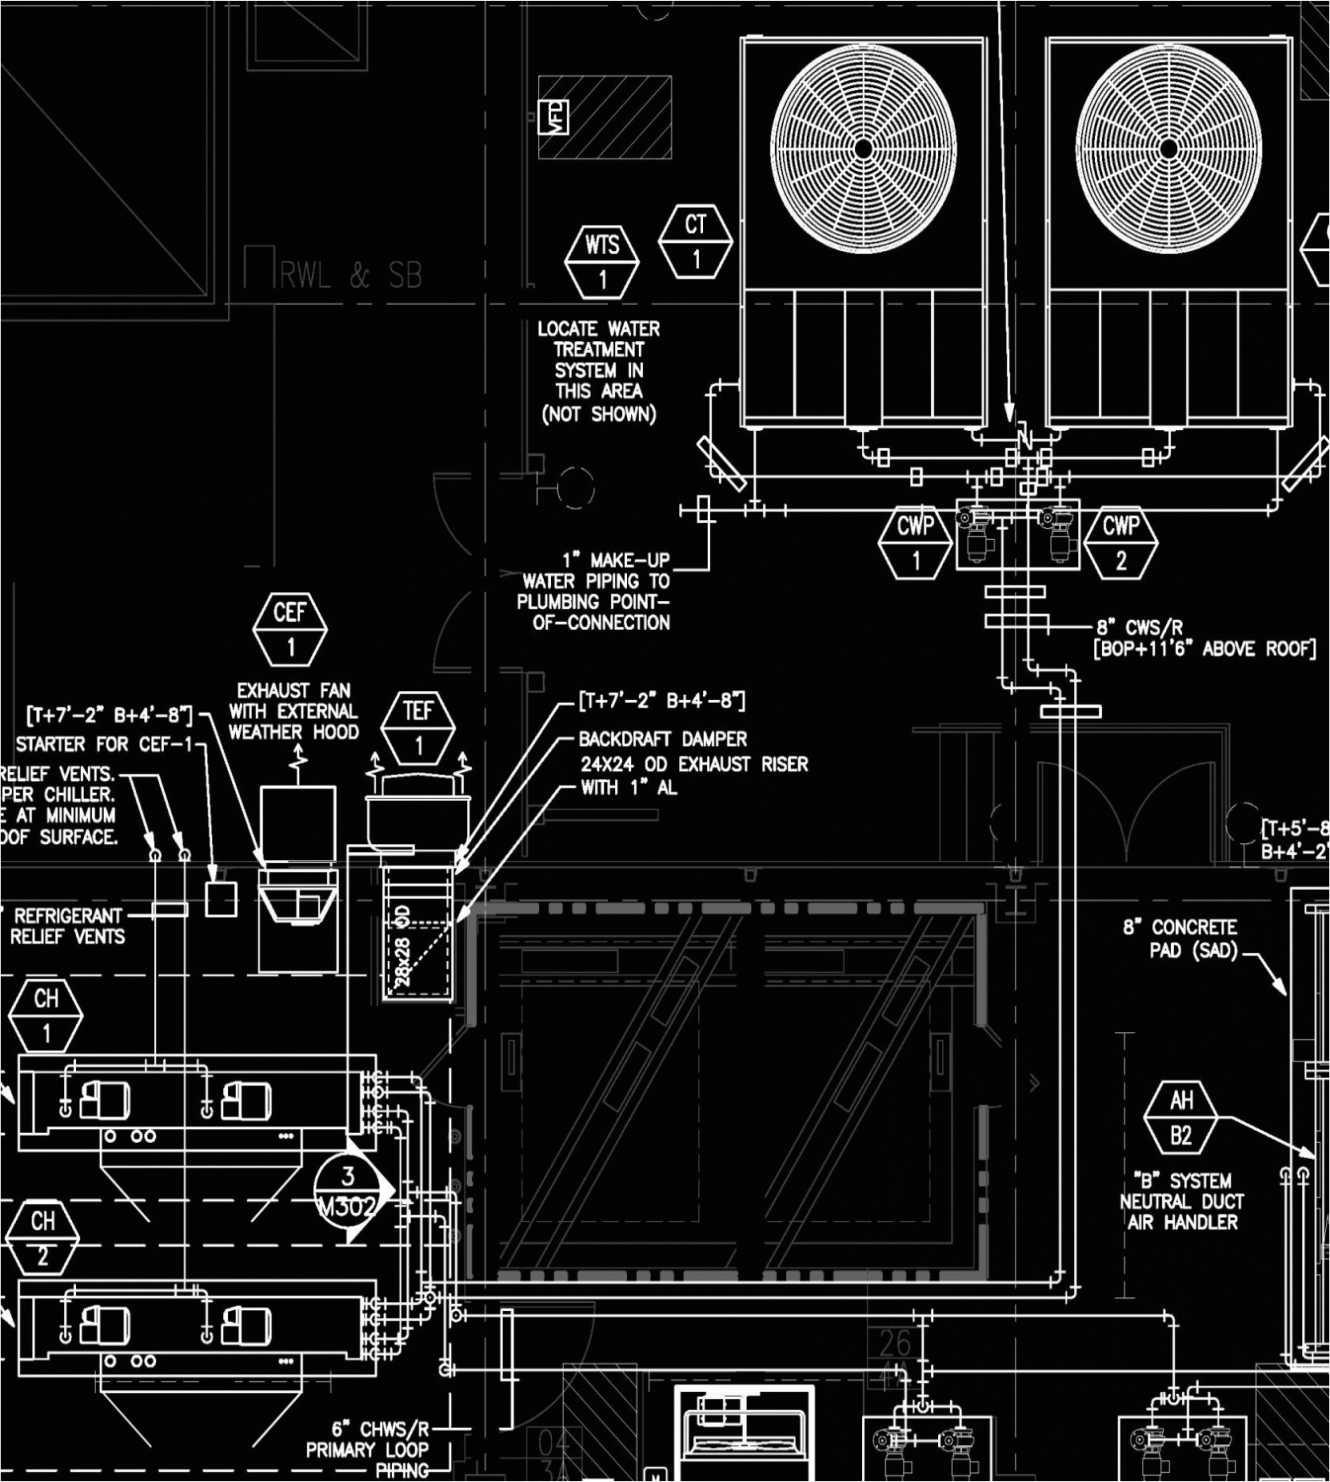 Nordyne E2Eb 015Ha Wiring Diagram | Manual E-Books - Nordyne E2Eb 015Ha Wiring Diagram